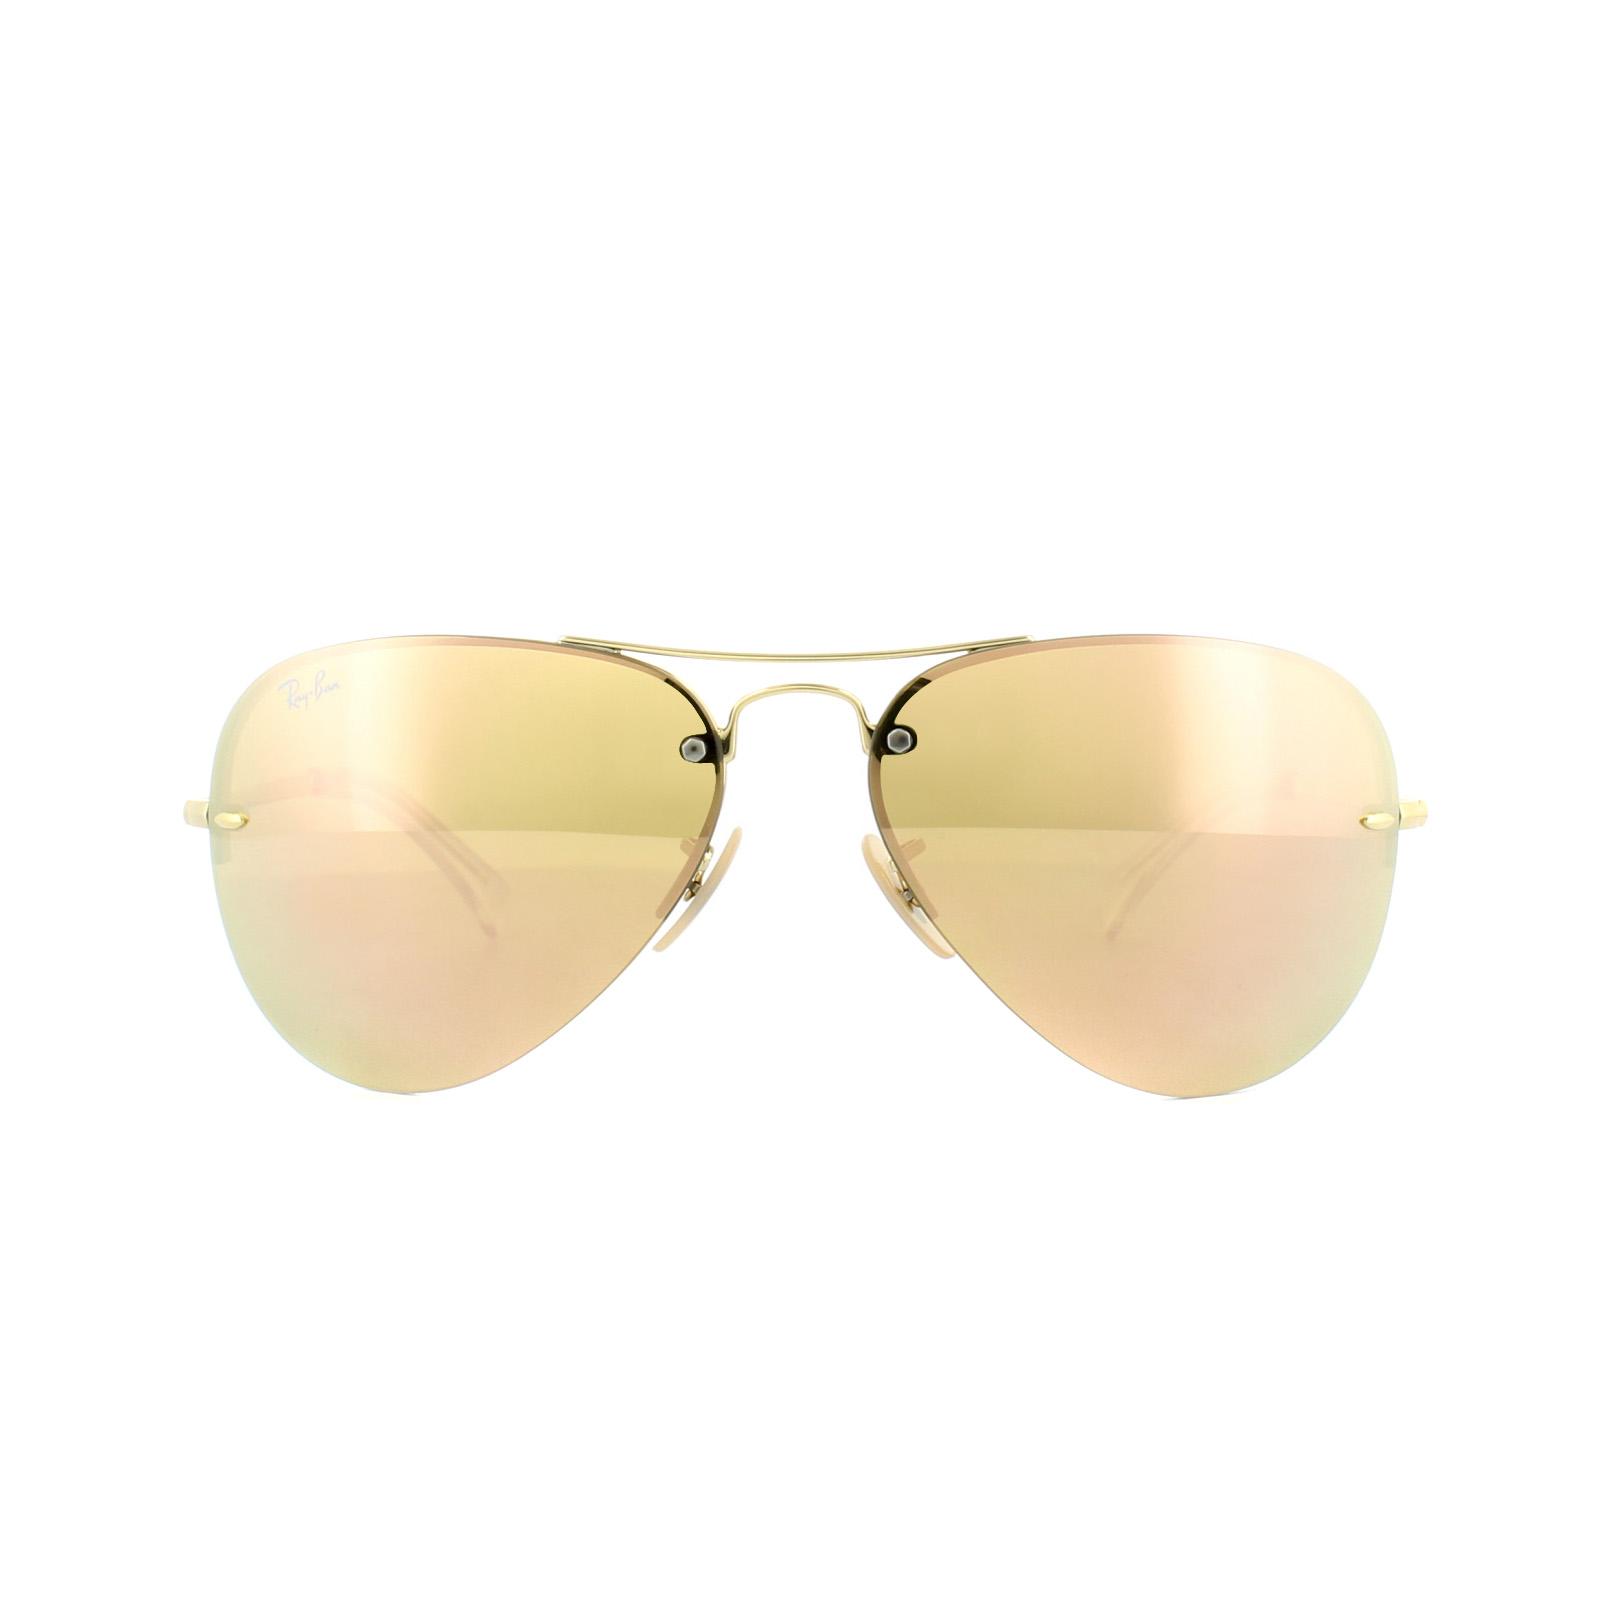 a7f602a6fb6 Ray-Ban Sunglasses 3449 001 2Y Gold Copper Mirror 8053672508093